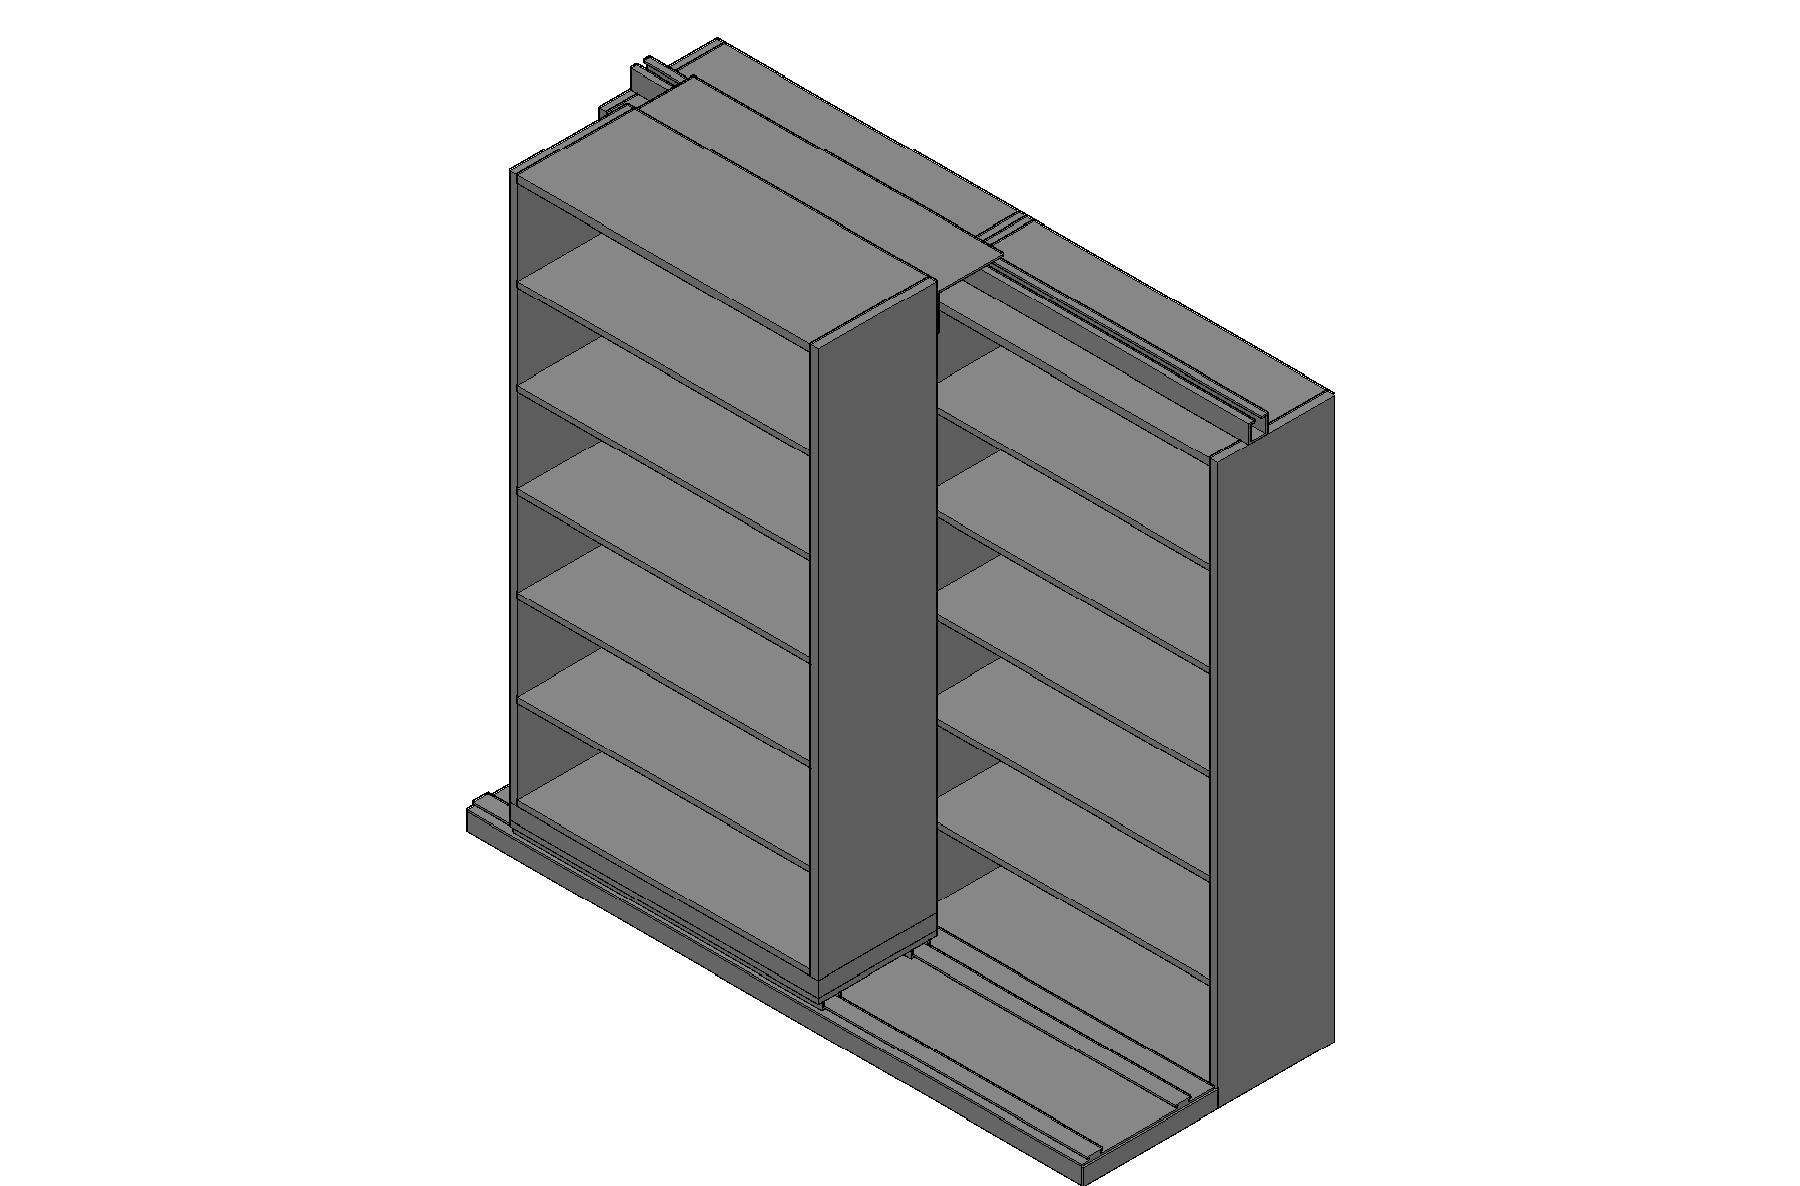 "Box Size Sliding Shelves - 2 Rows Deep - 6 Levels - (42"" x 16"" Shelves) - 88"" Total Width"